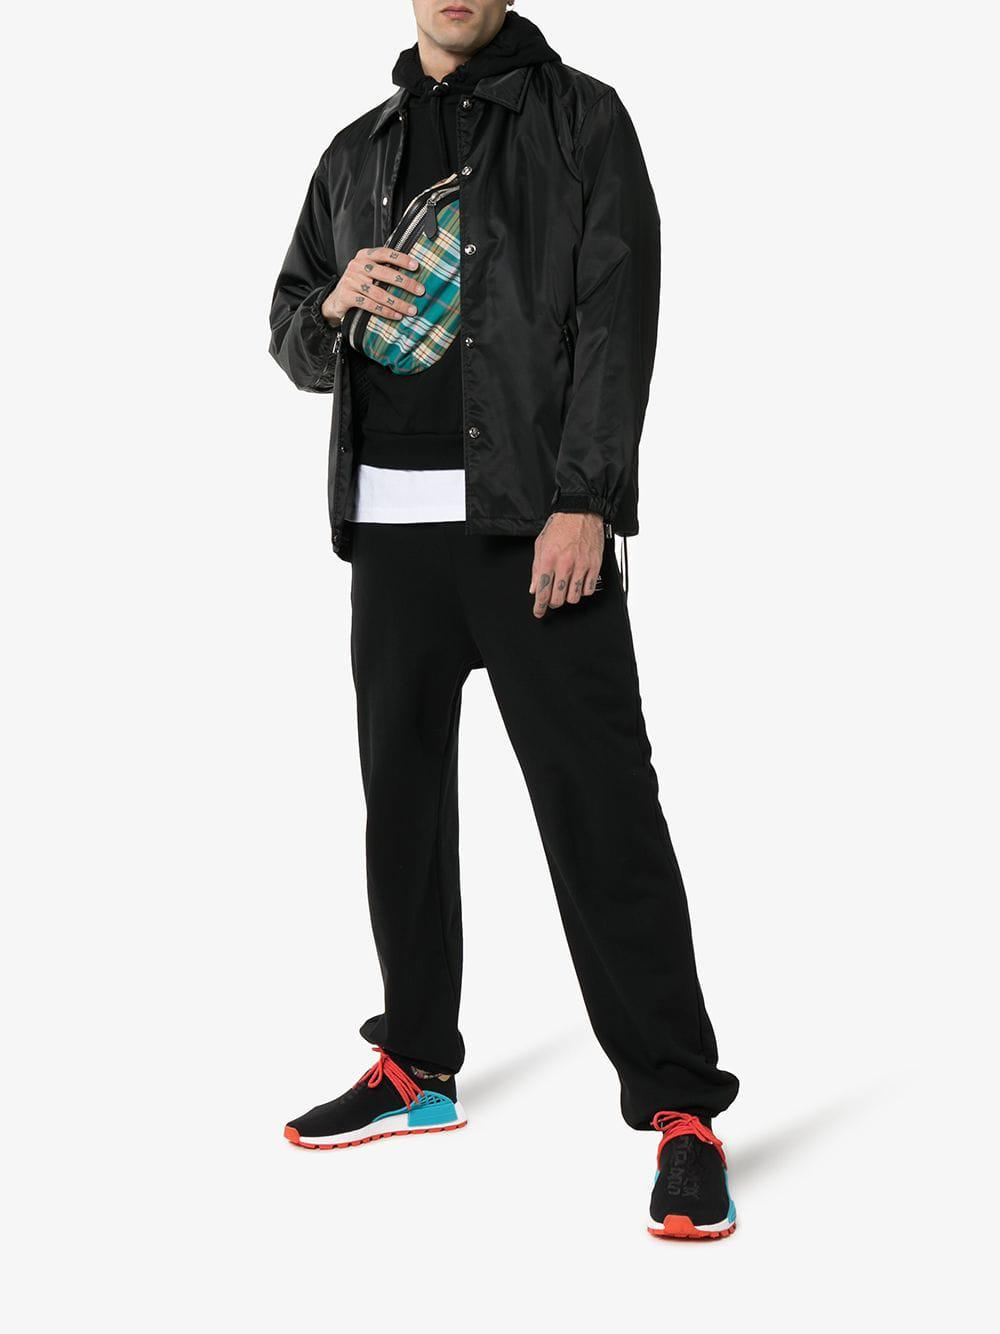 dc78f6096 Lyst - adidas X Pharrell Williams Black Human Body Nmd Sneakers in Black  for Men